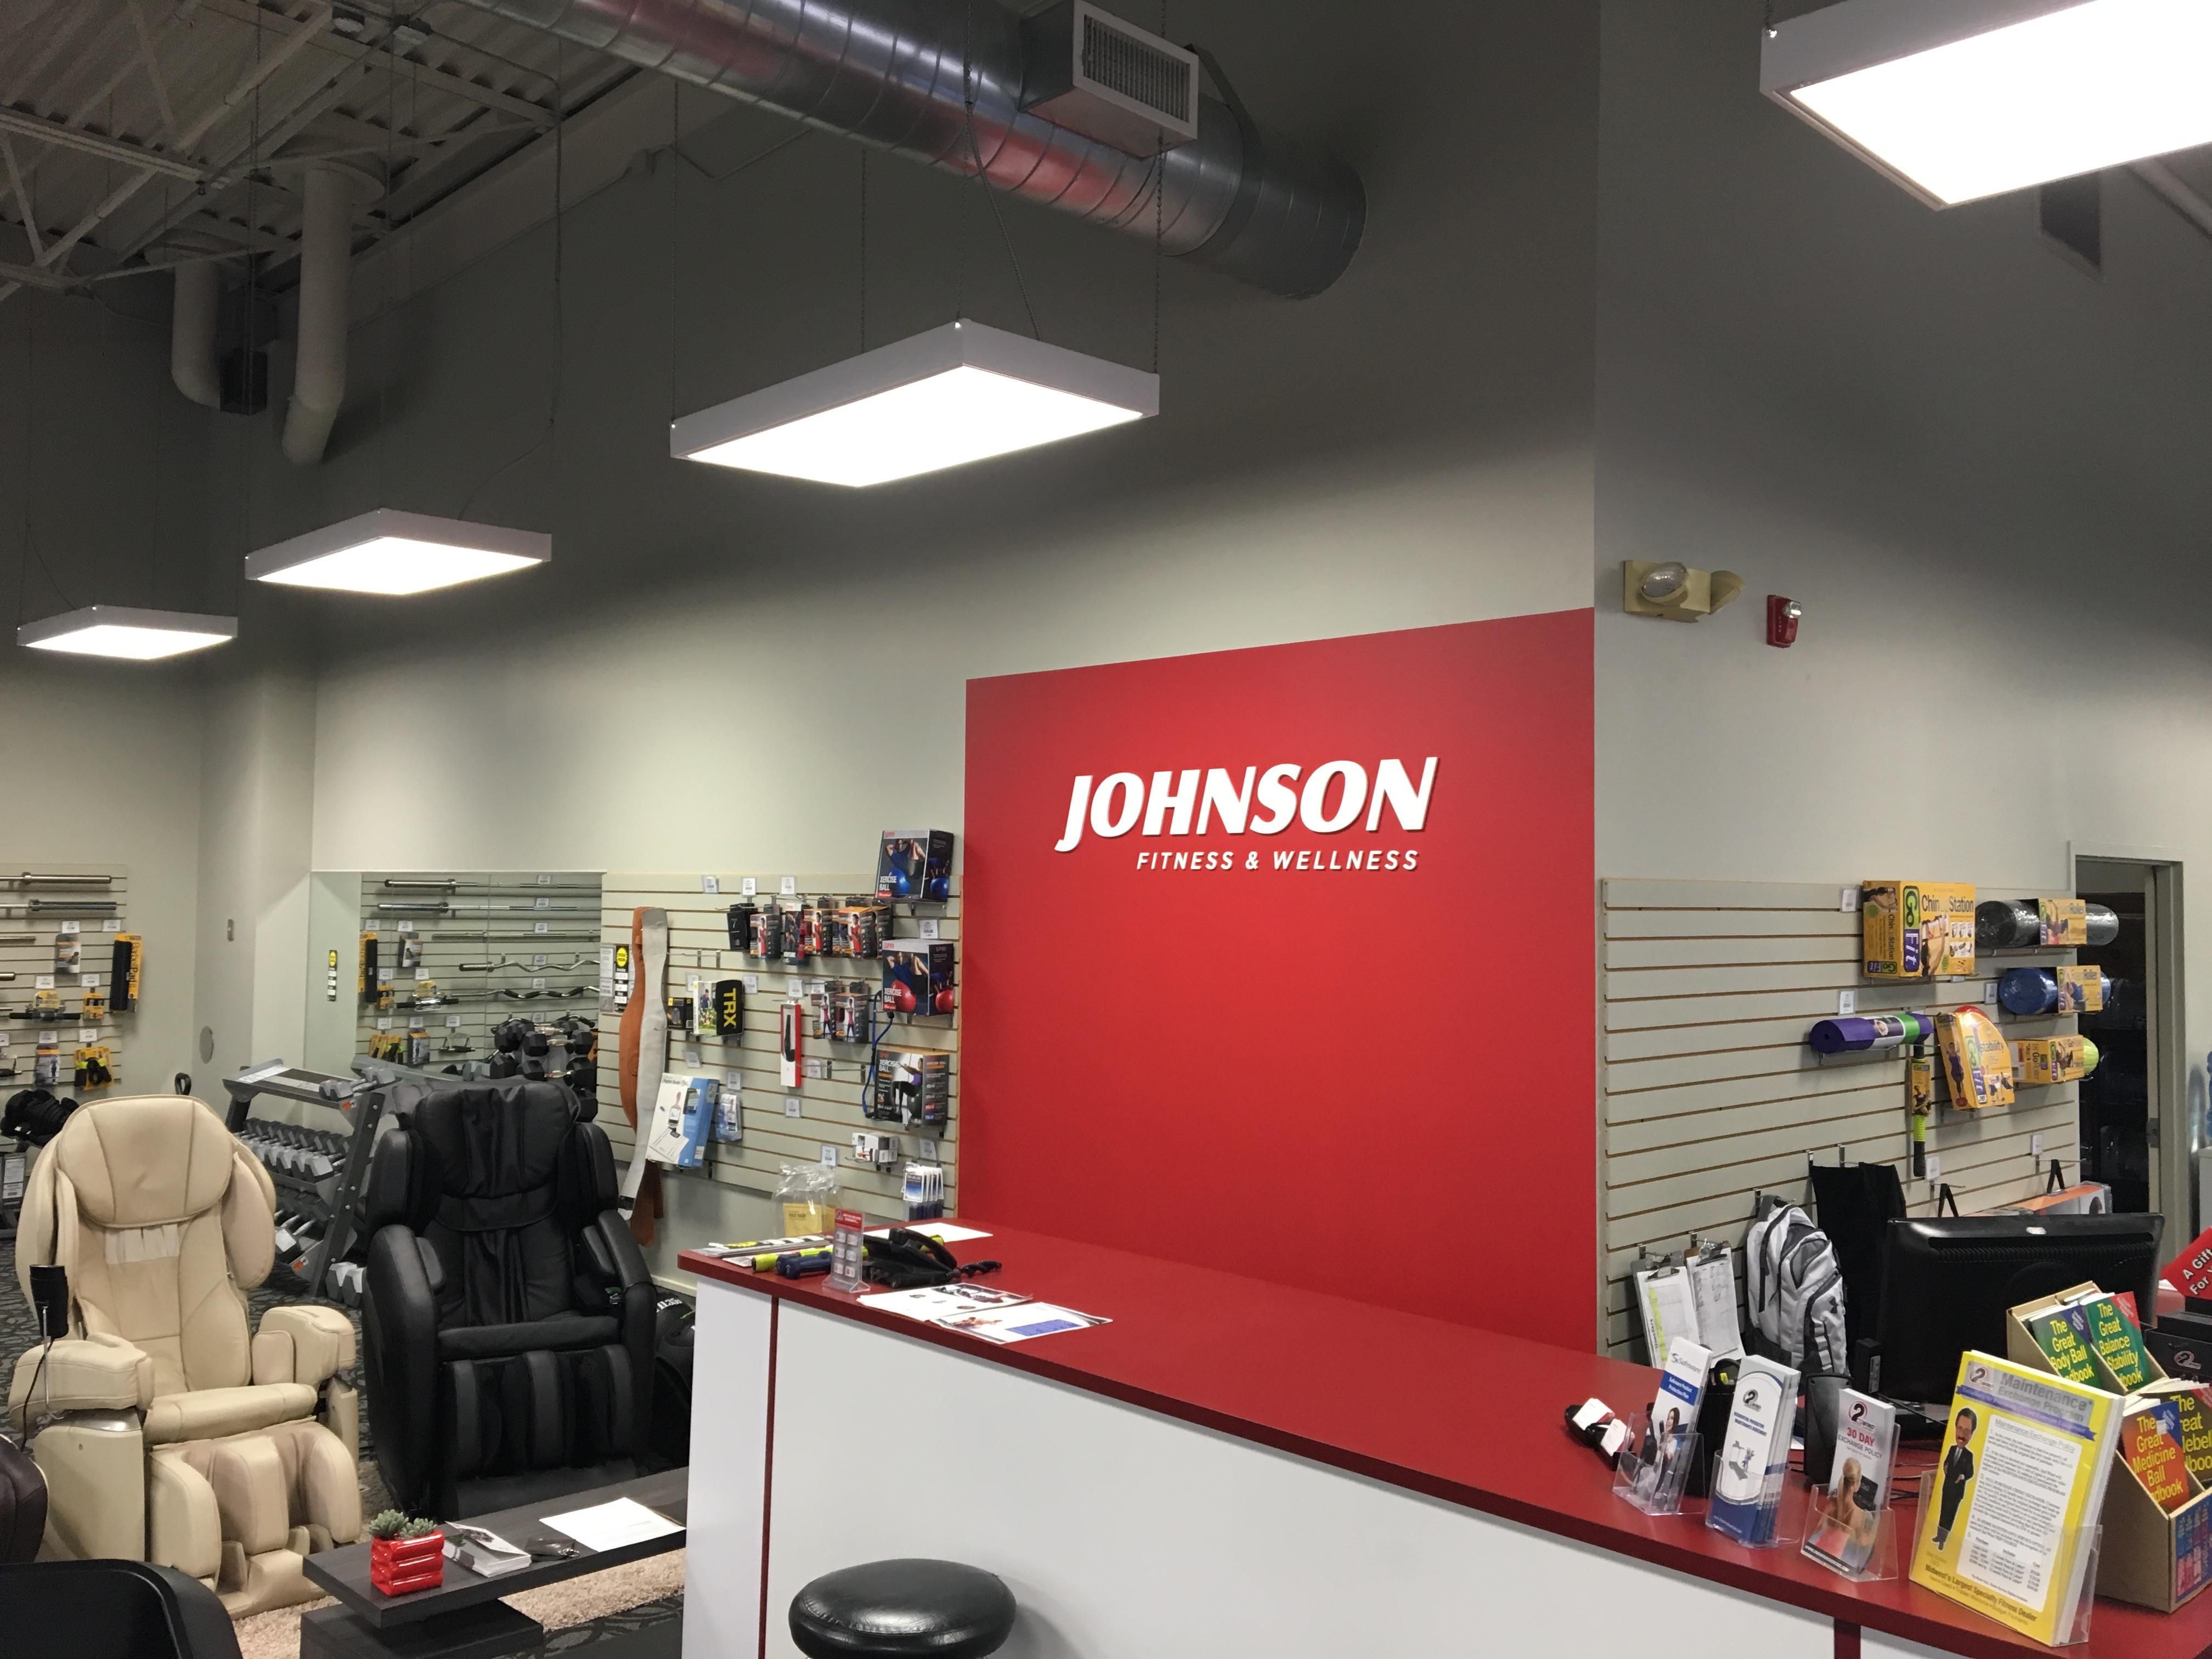 Johnson Fitness & Wellness - Ankeny, IA